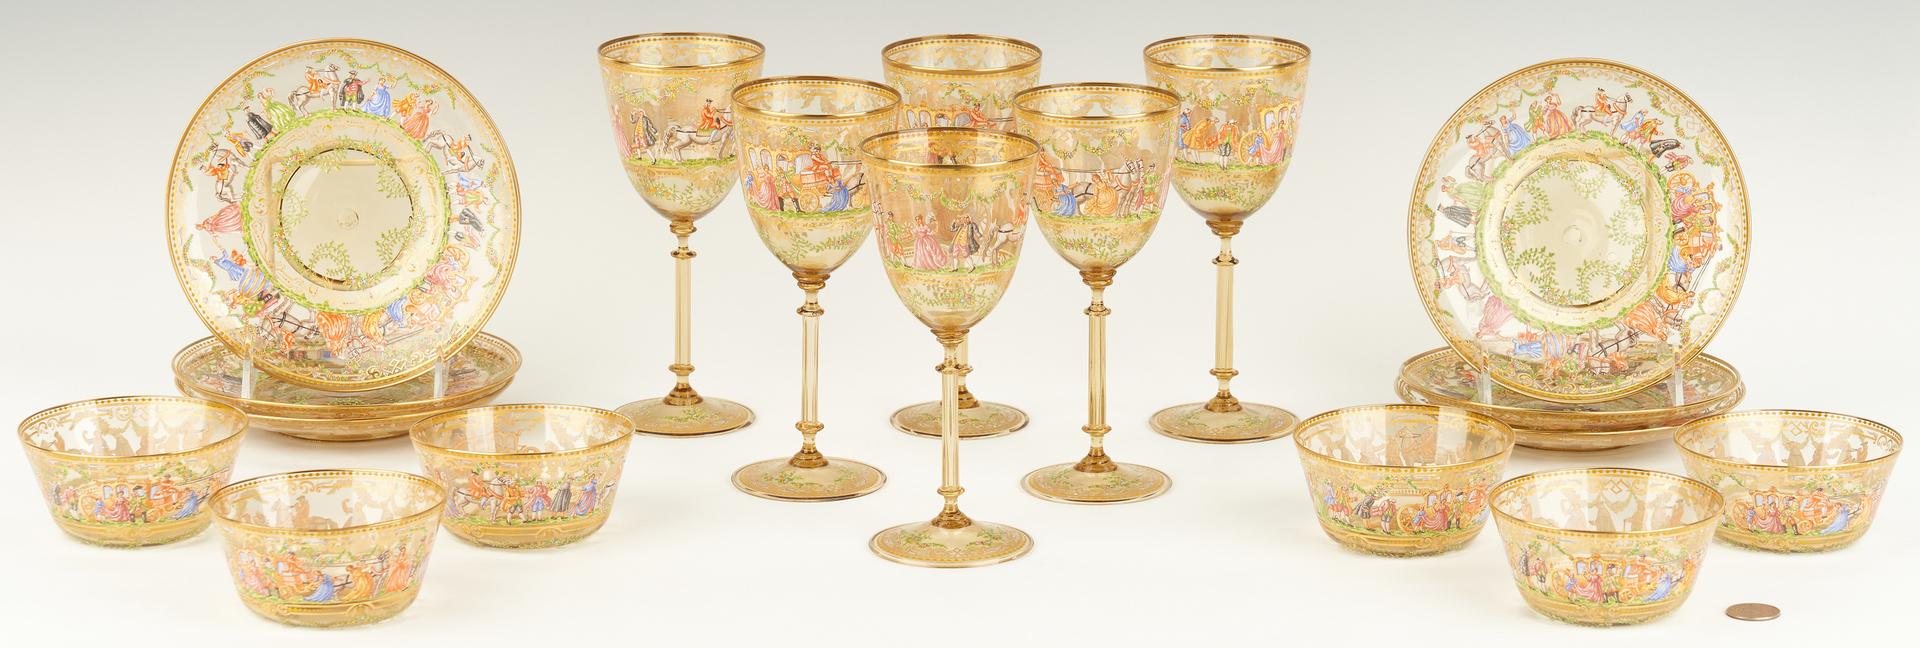 Lot 541: Bohemian or Venetian Enameled Glass Dessert Service, 29 items